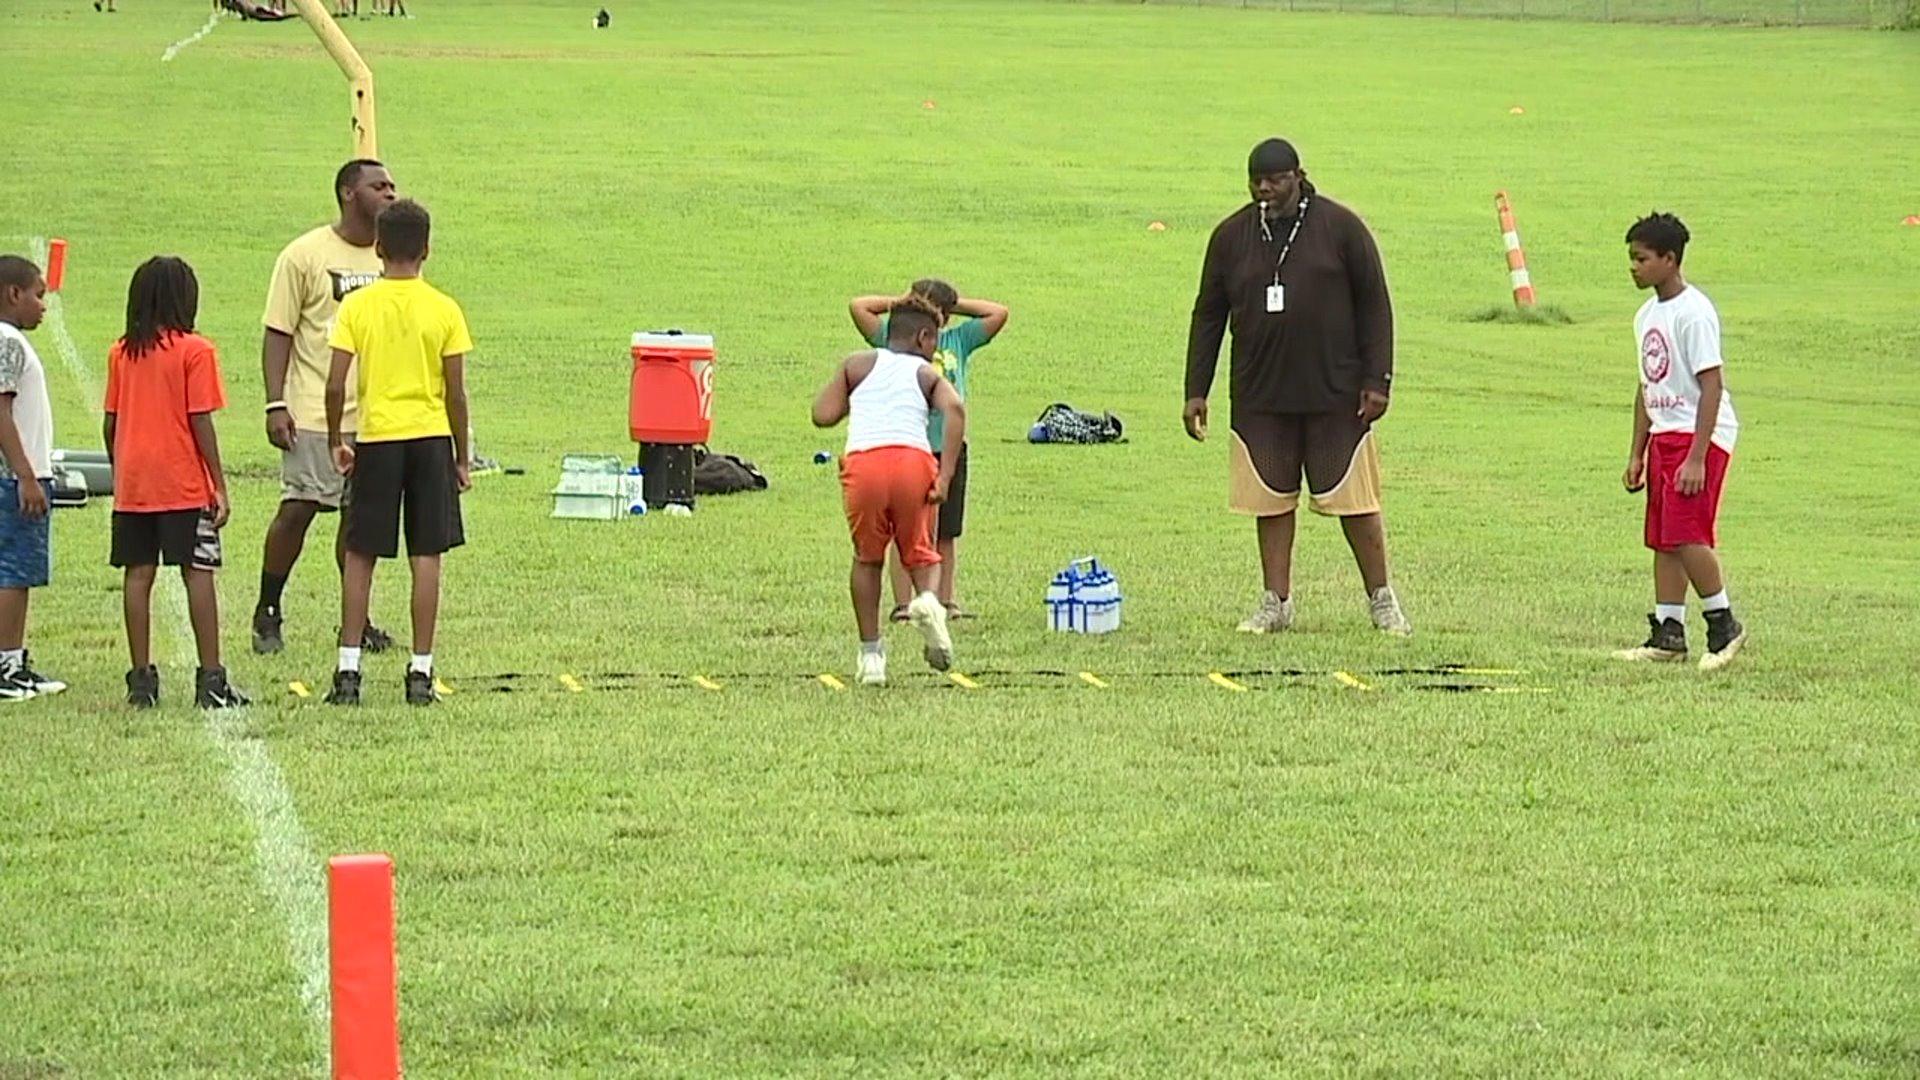 COVID-19 putting financial strain on community football program